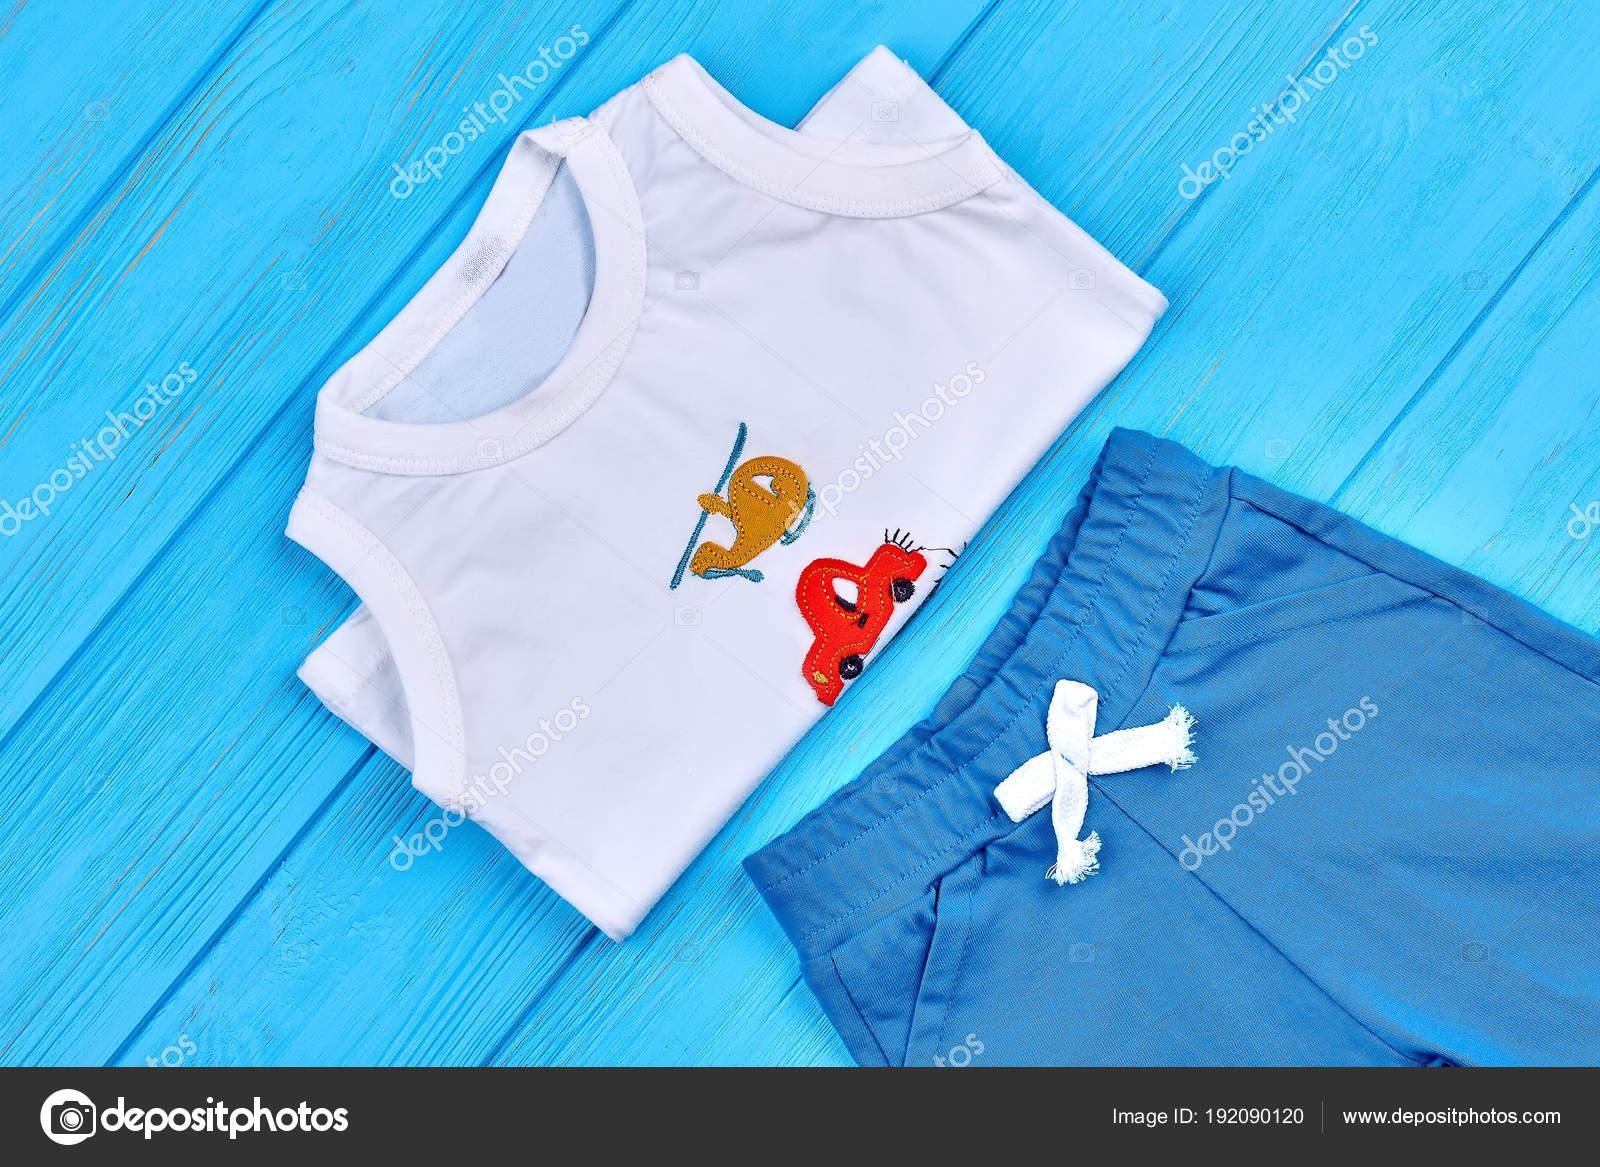 2b8e7e82670 Λίγο βαμβάκι αγόρι καλοκαιρινό κοστούμι. Νήπια αγόρια ξύλινο φυσικό ρούχα,  μπλε φόντο. Μωρό αγόρι casual ντύσιμο — Εικόνα από ...